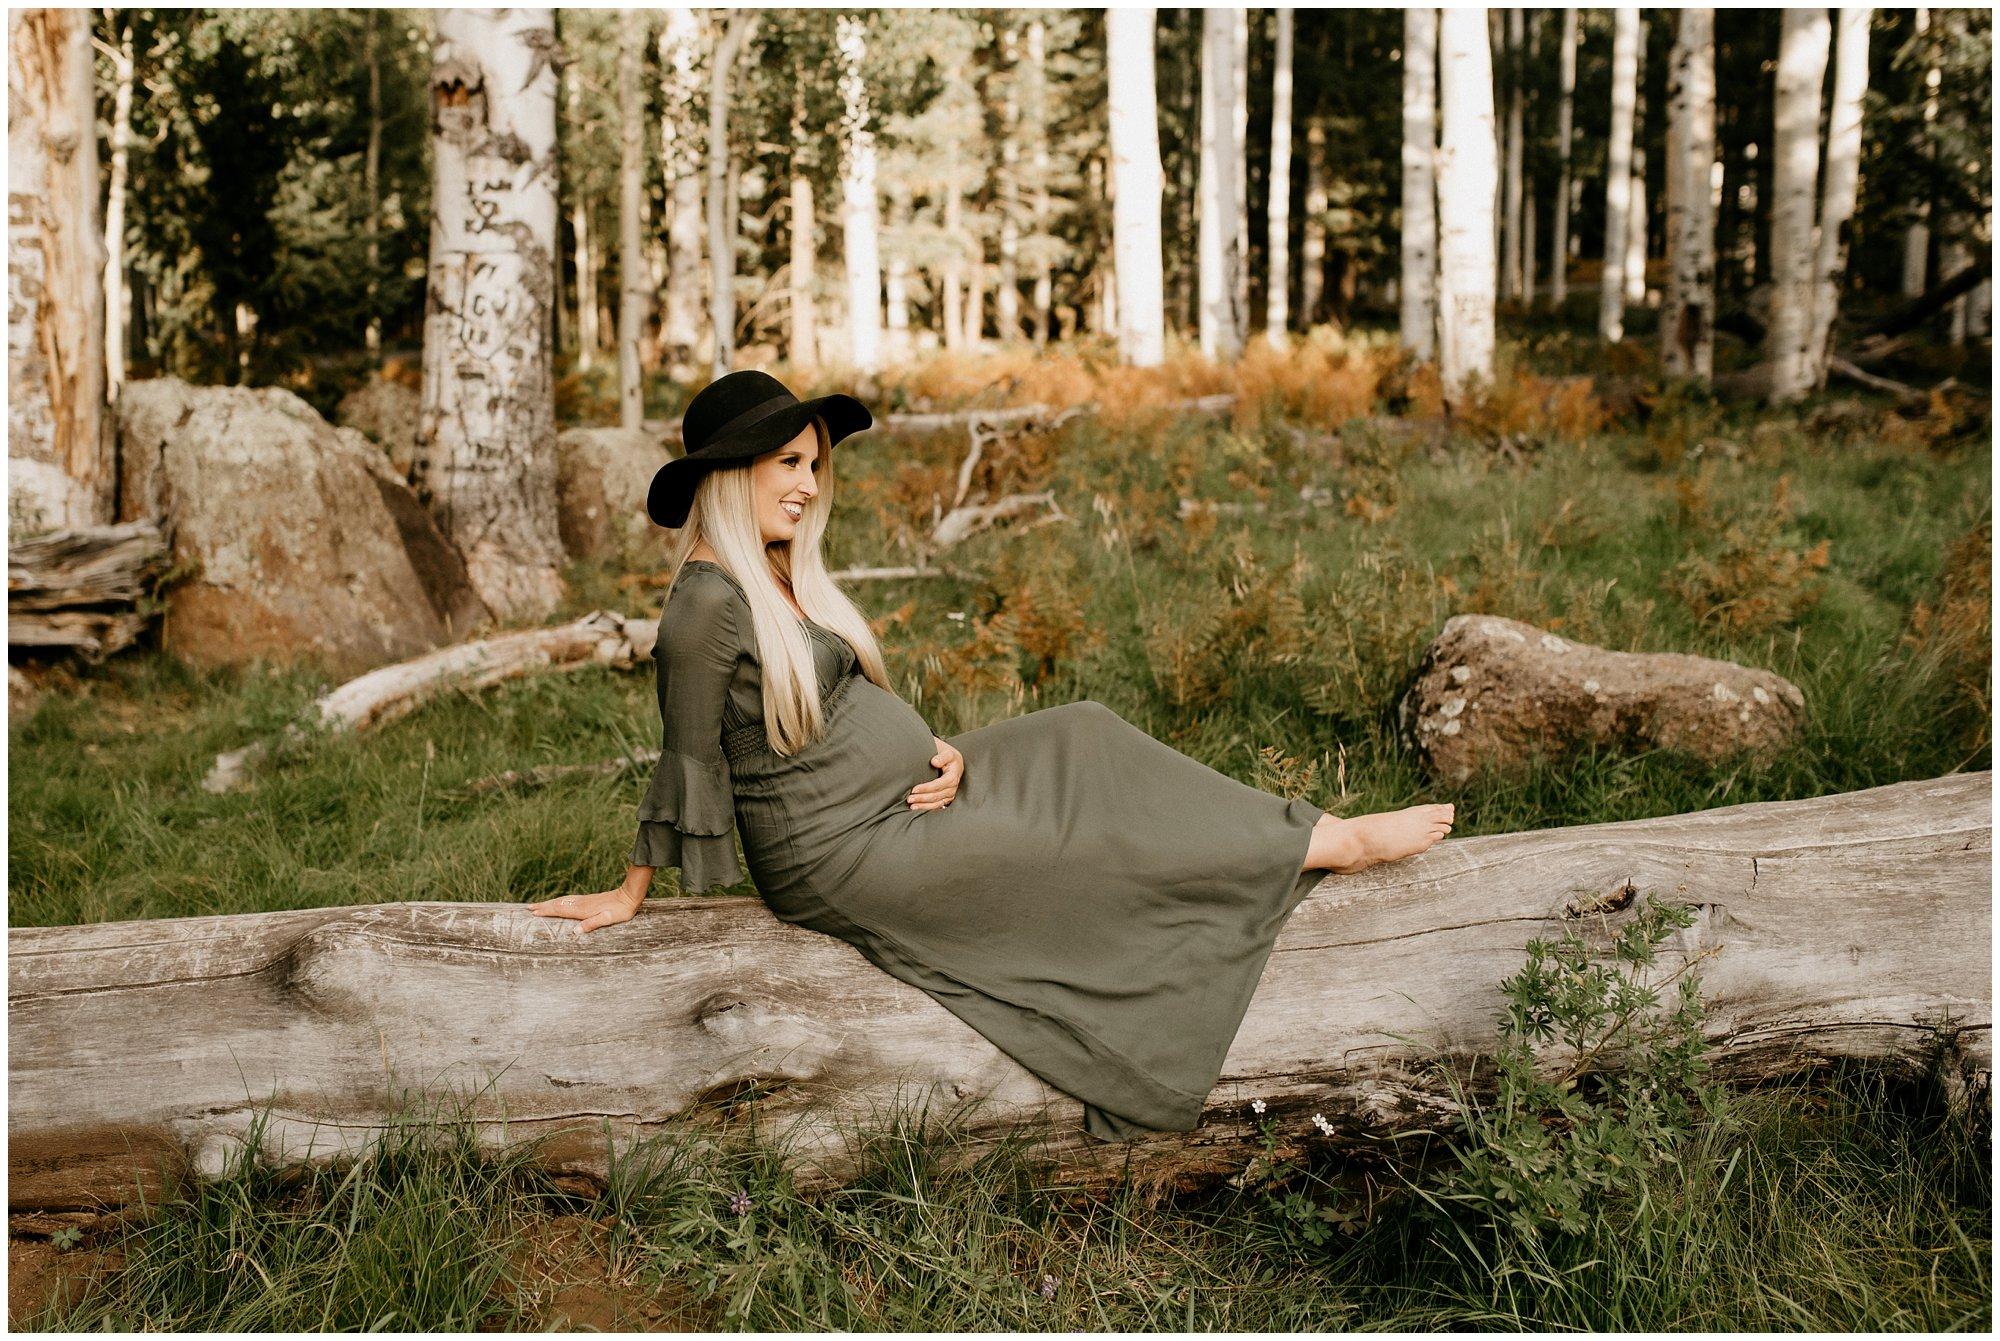 Flagstaff Aspen Tree Portrait Session - Gabby + Gary - Ashtyn Nicole Photo_0032.jpg